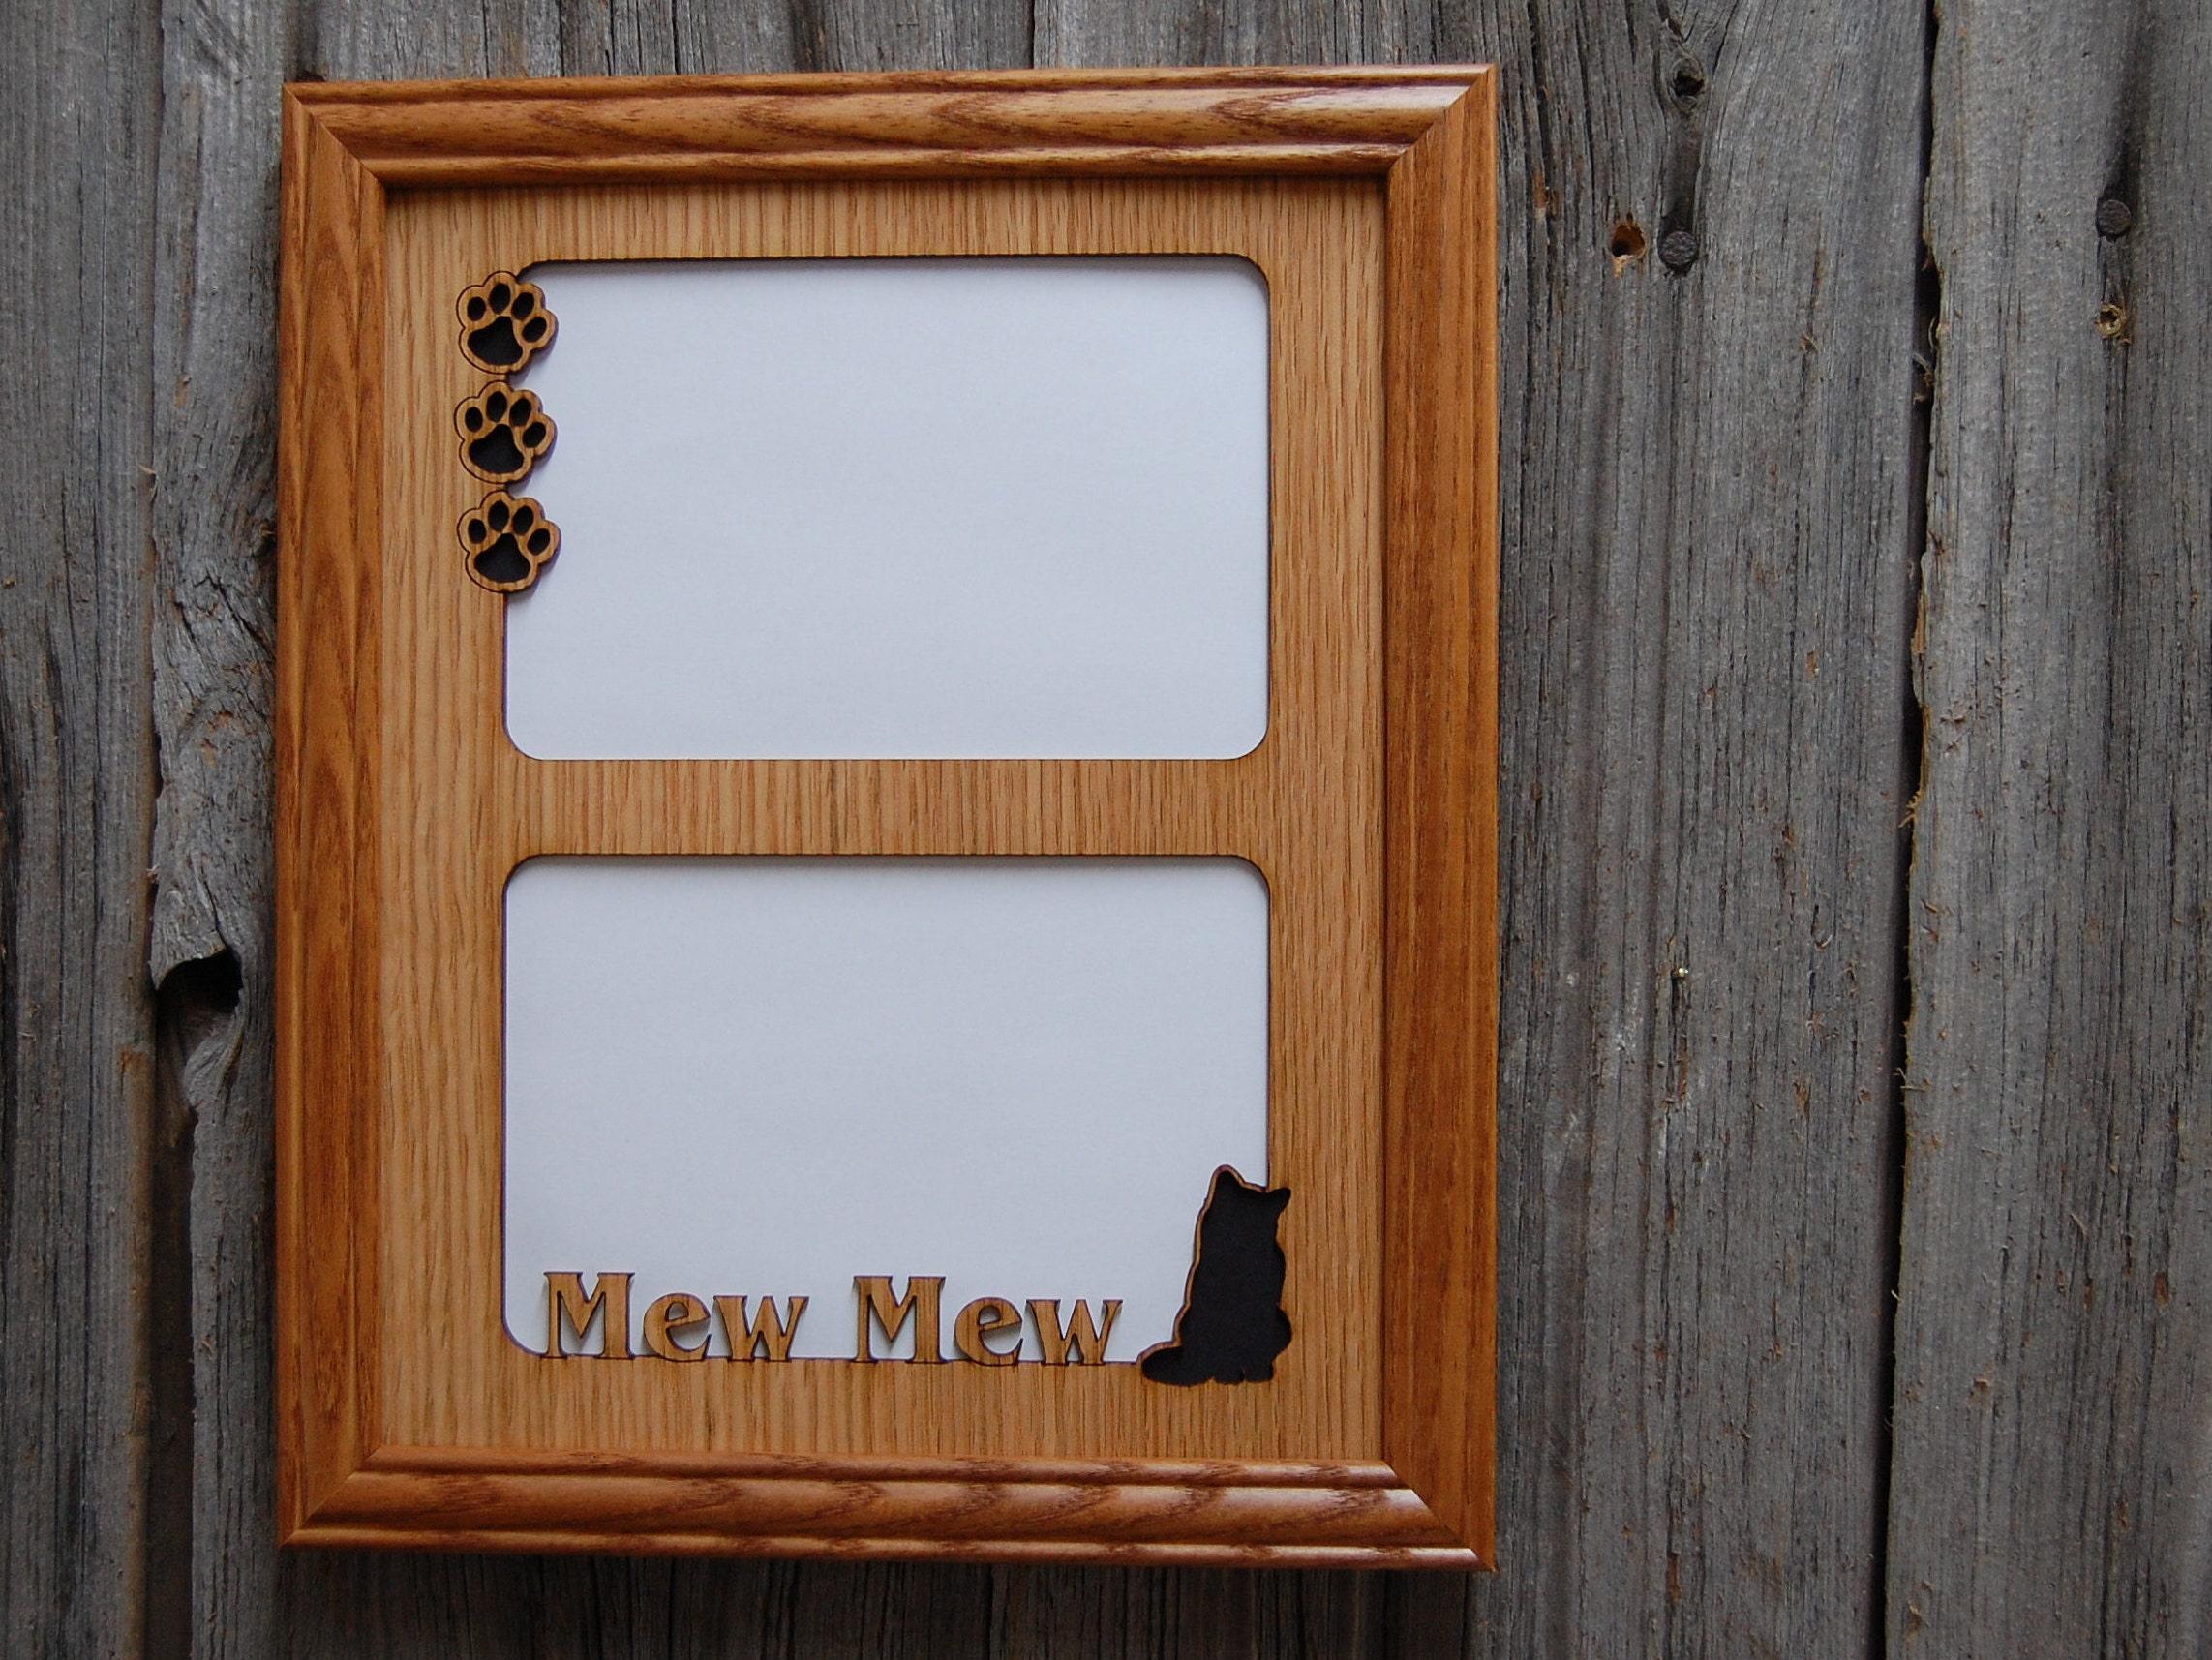 8 x 10 personalisierte Katze namens Bild Rahmen 2 Öffnungen